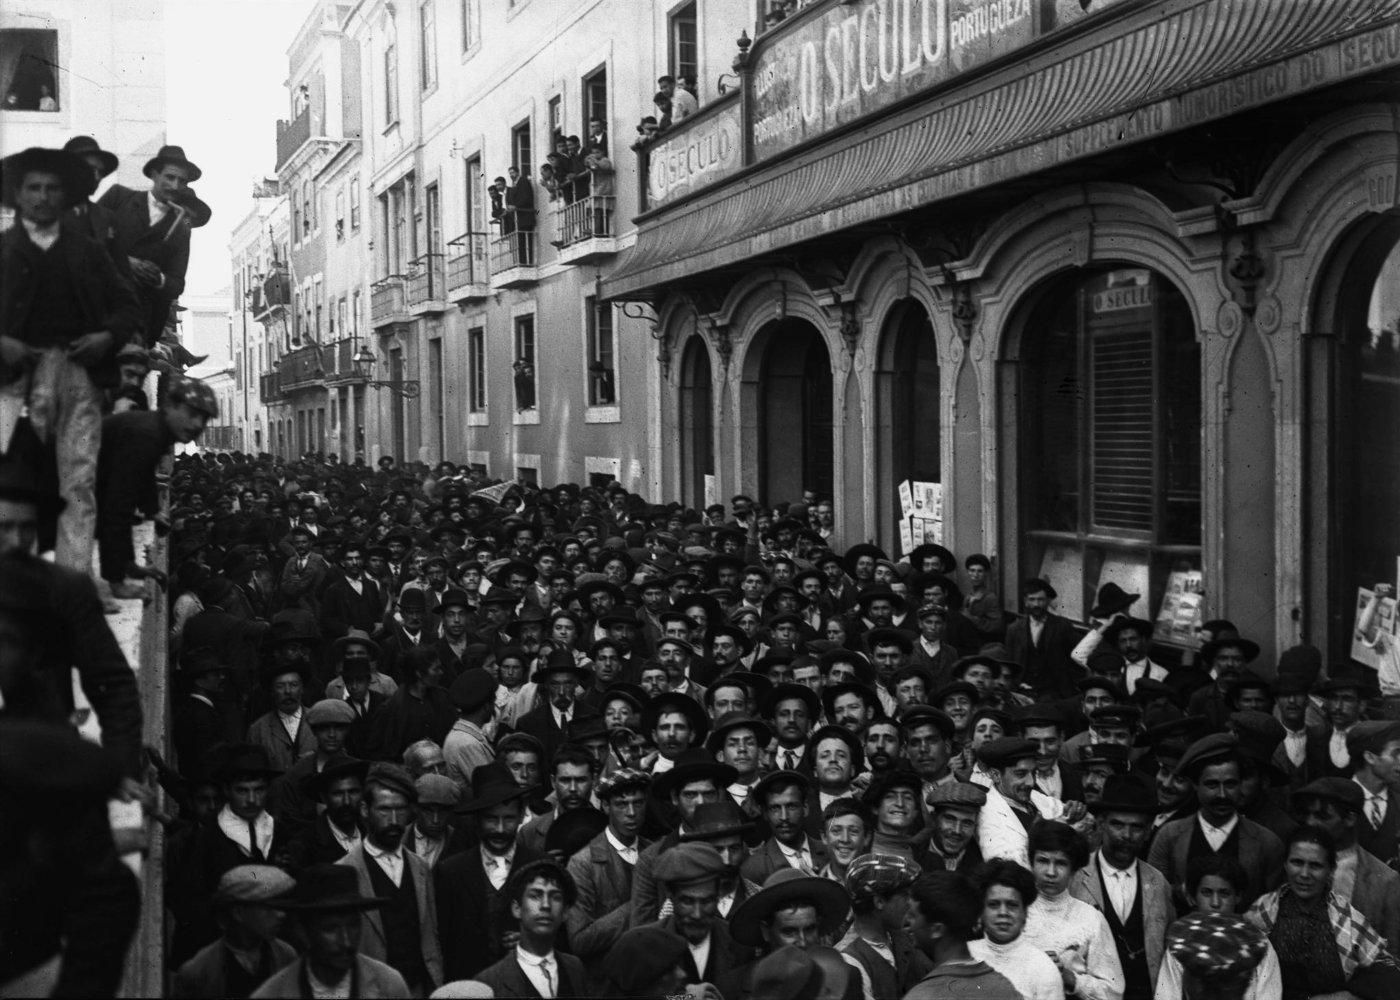 Greves em Portugal em 1920